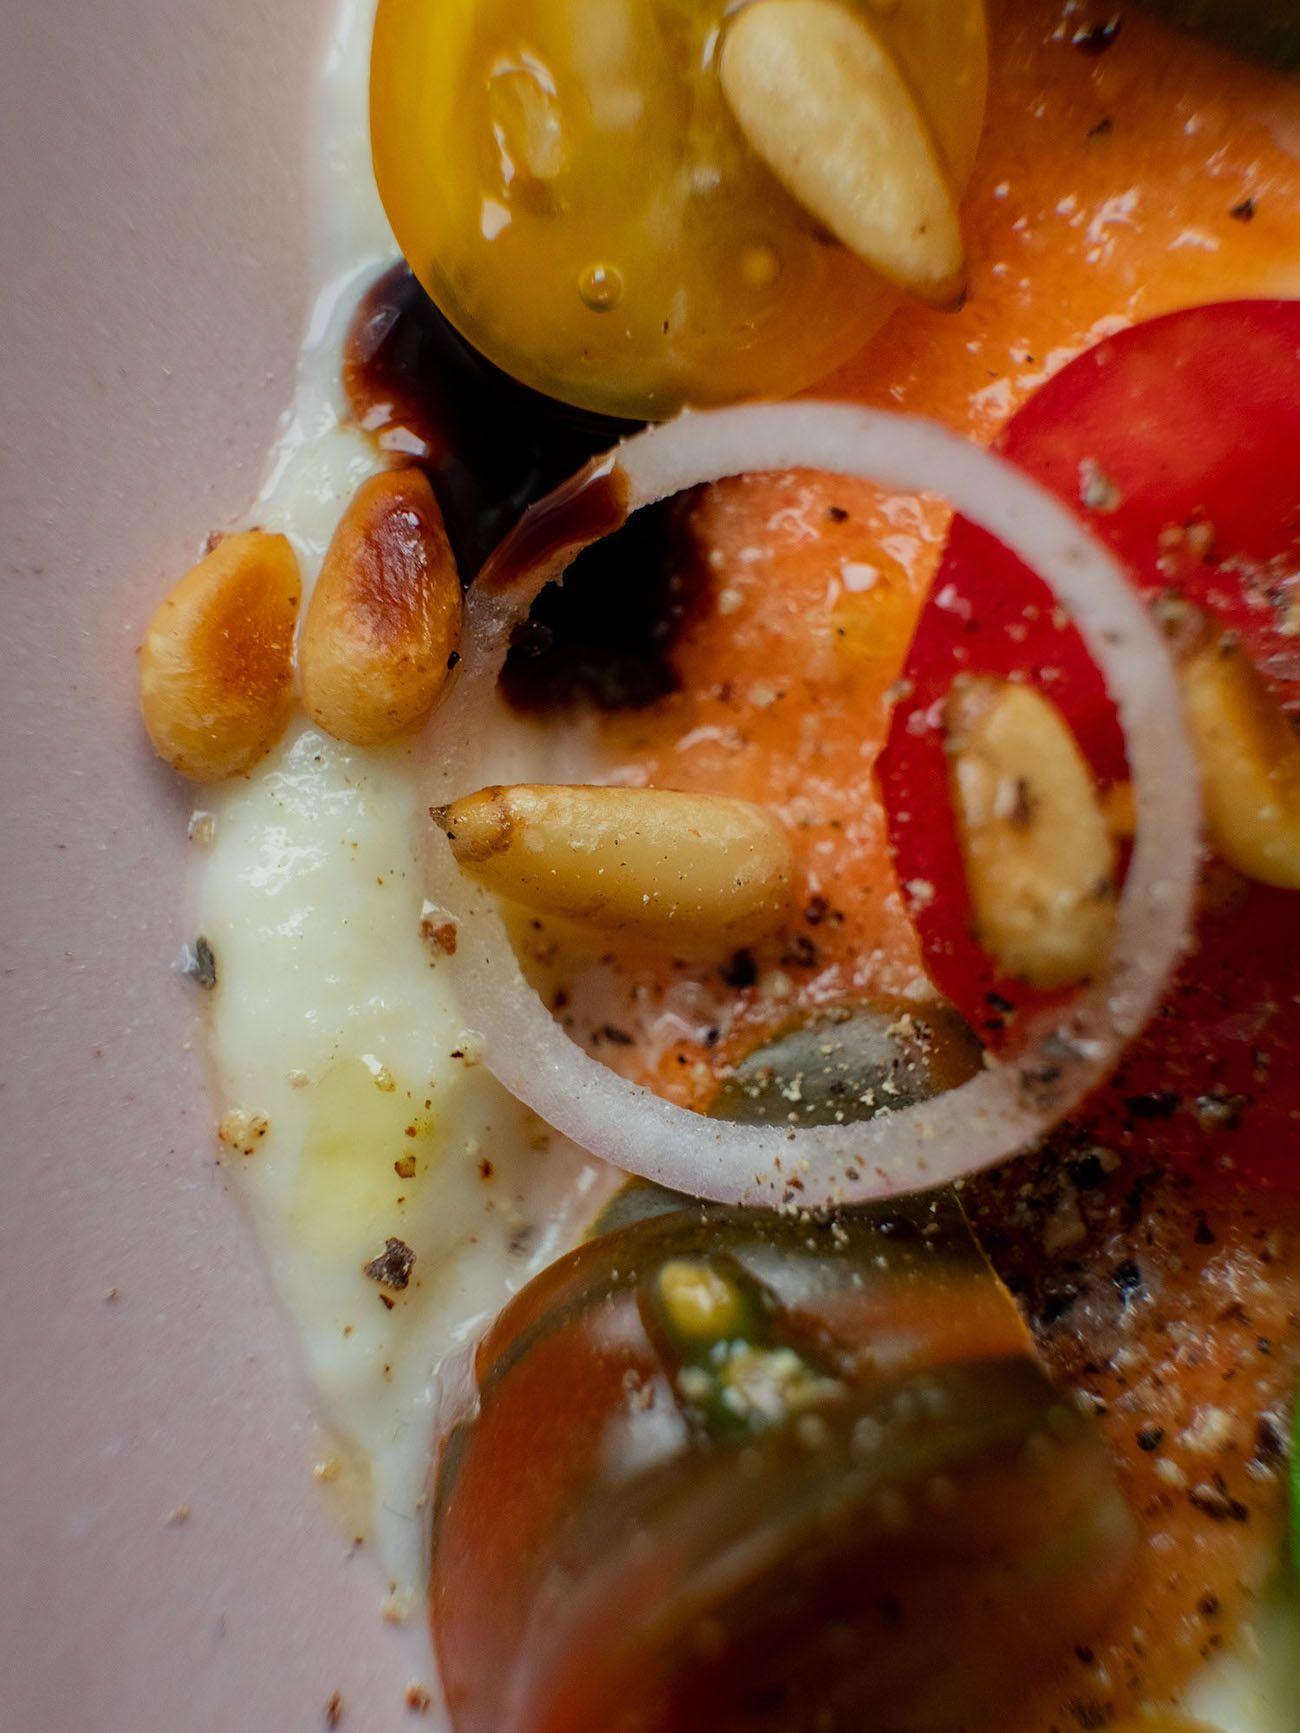 Foodblog, About Fuel, Rezept, Caprese Salat, Mozzarella